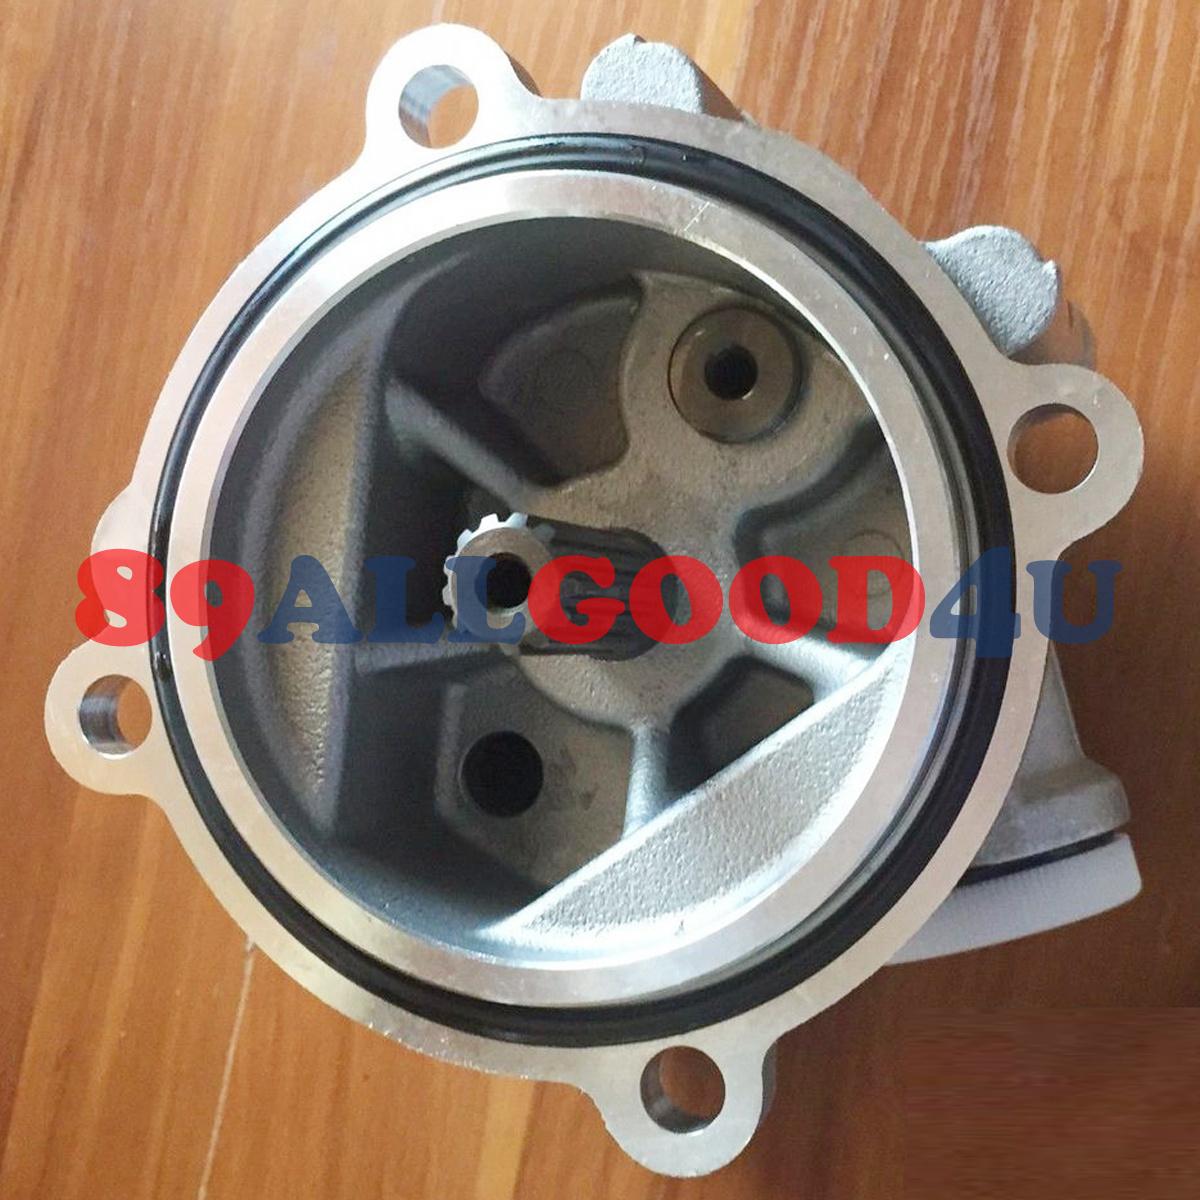 Details about Gear Pump 13T 4 Holes For Kawasaki K3V112DT Mitsubishi 6D34  Kobelco SK200-6